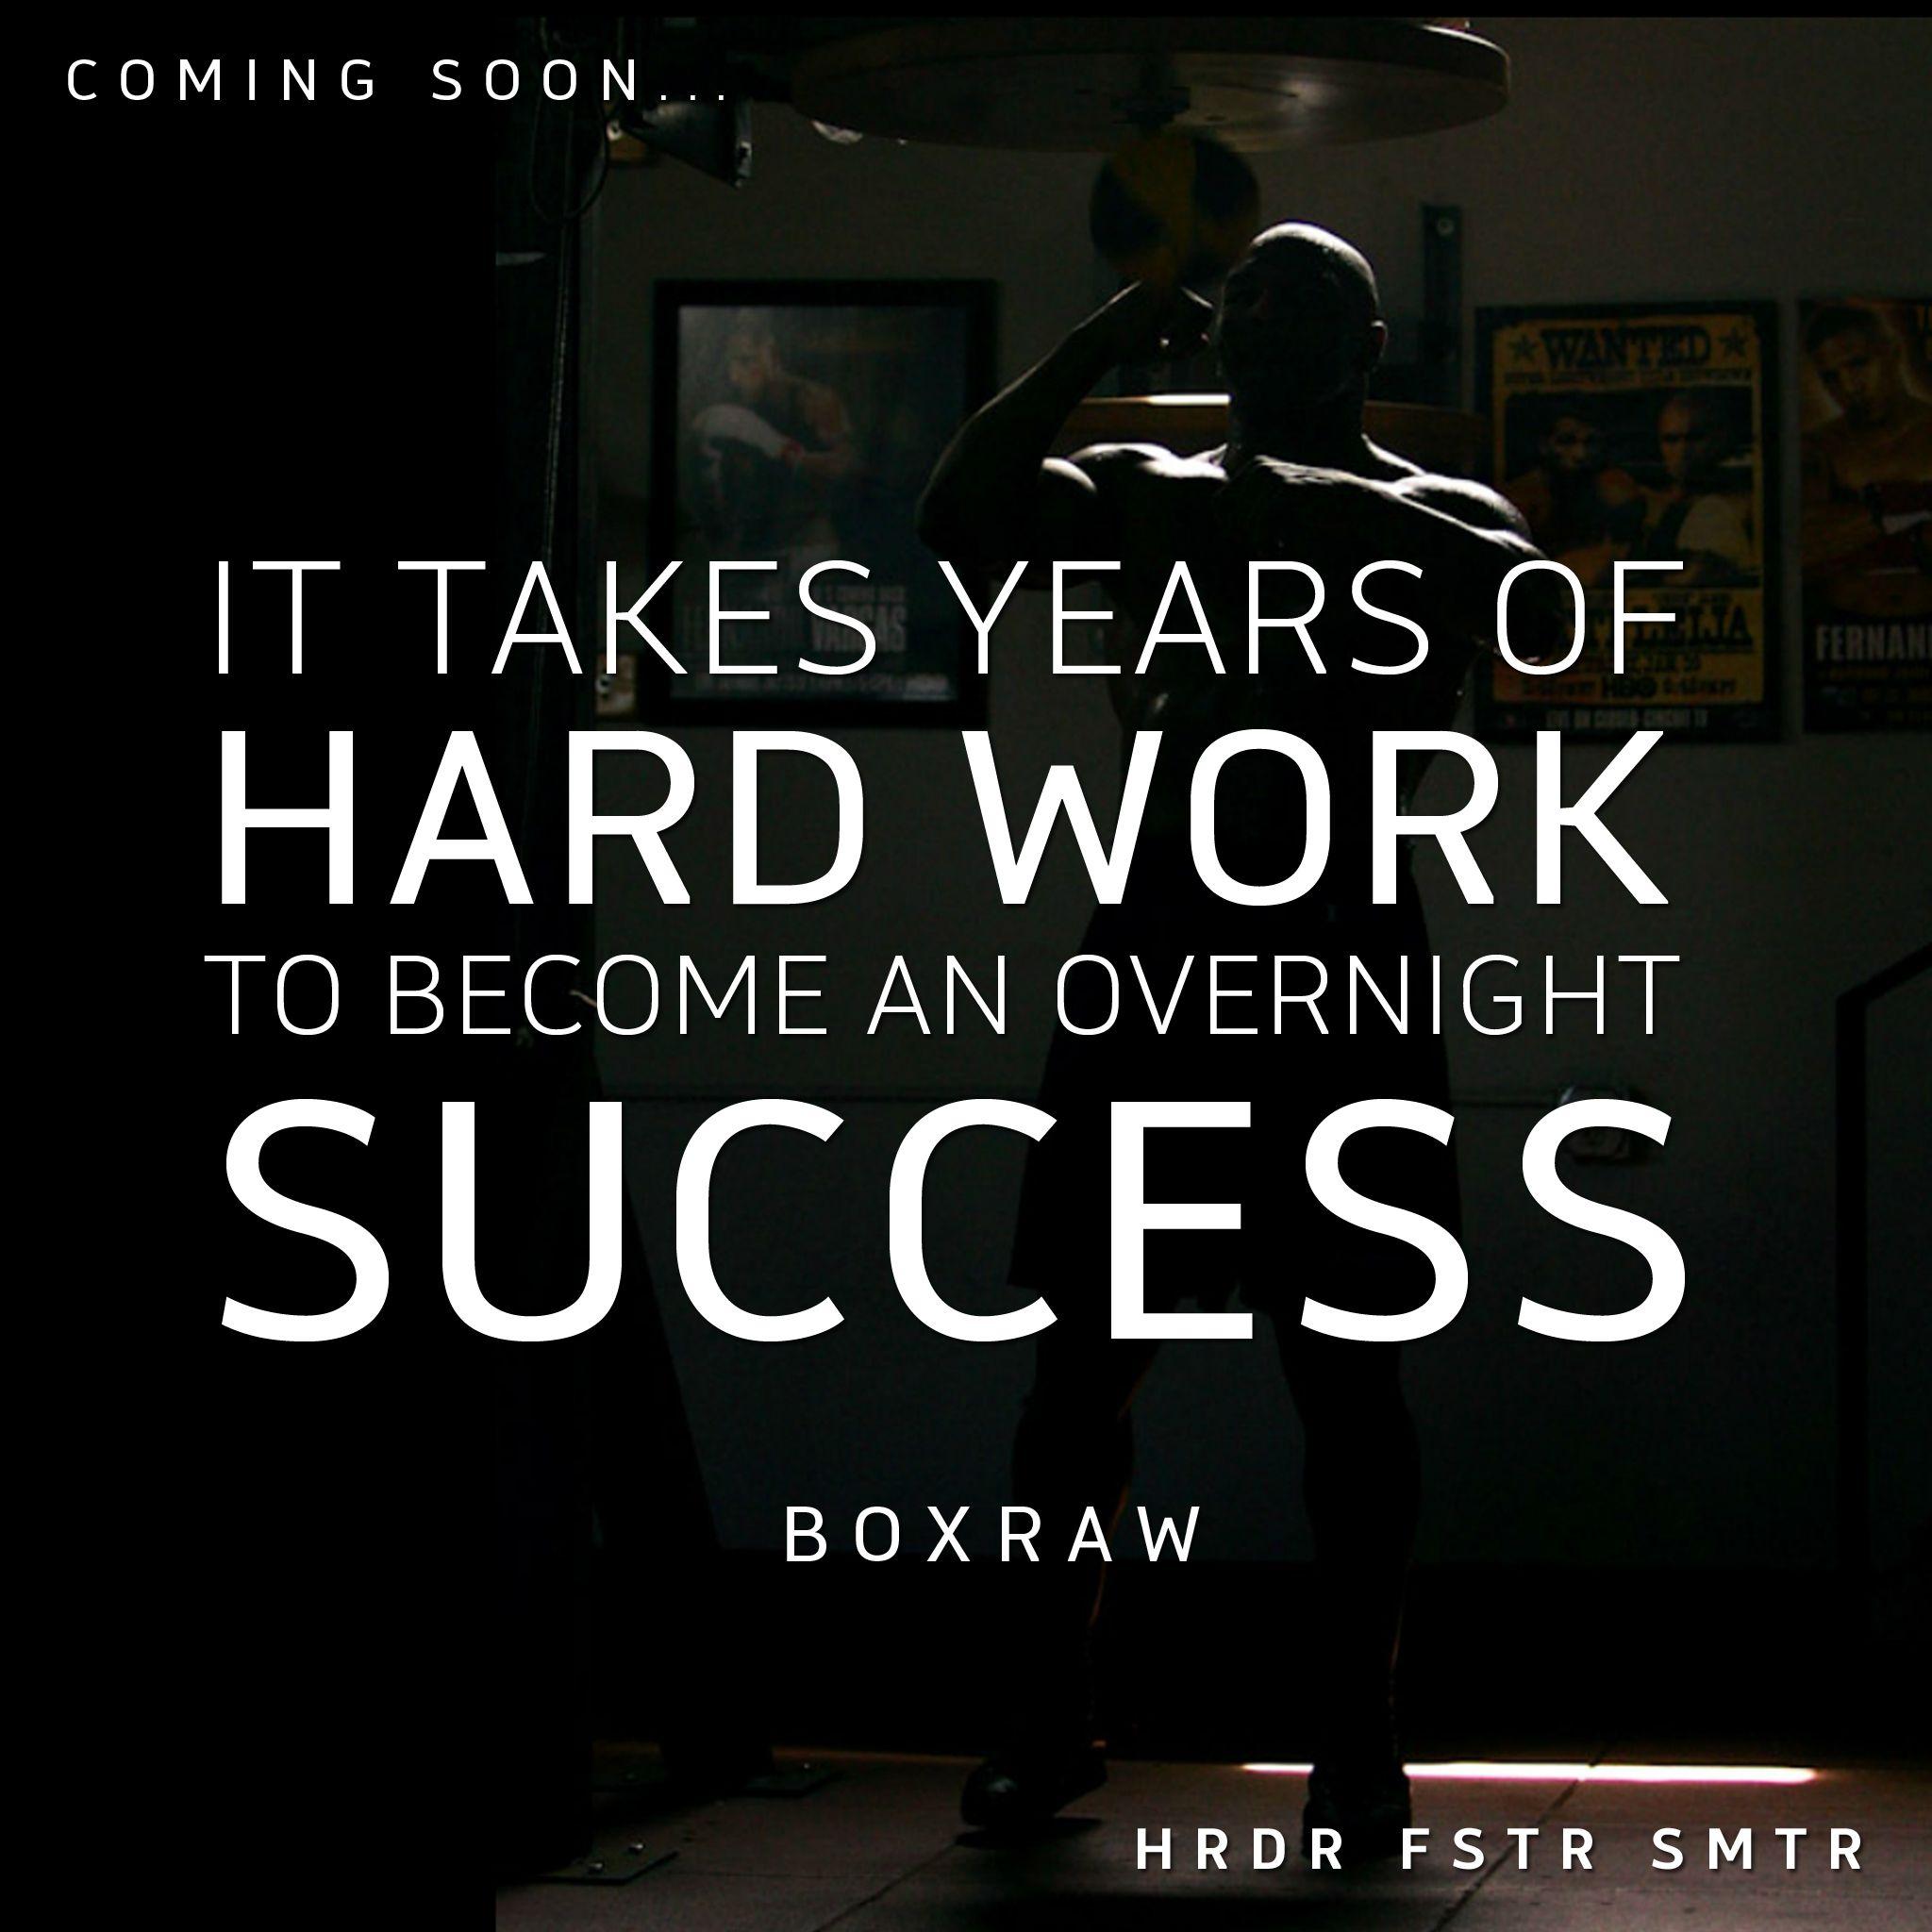 hard work, success, boxing